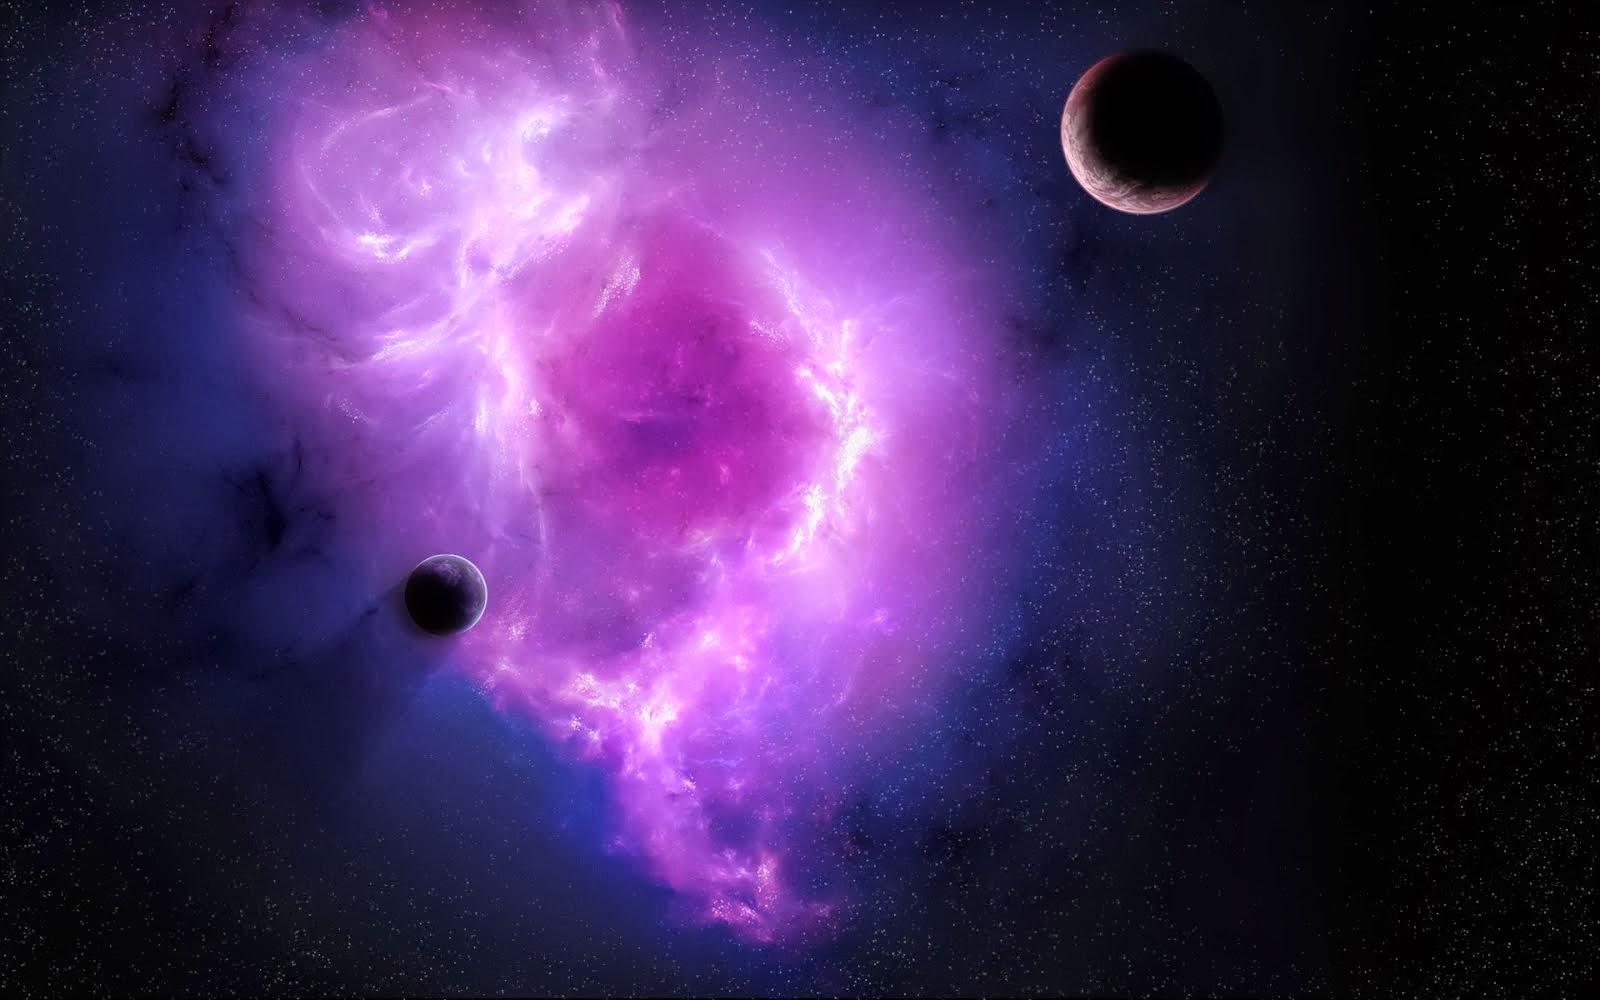 Space Nebula Wallpaper | Space Wallpaper